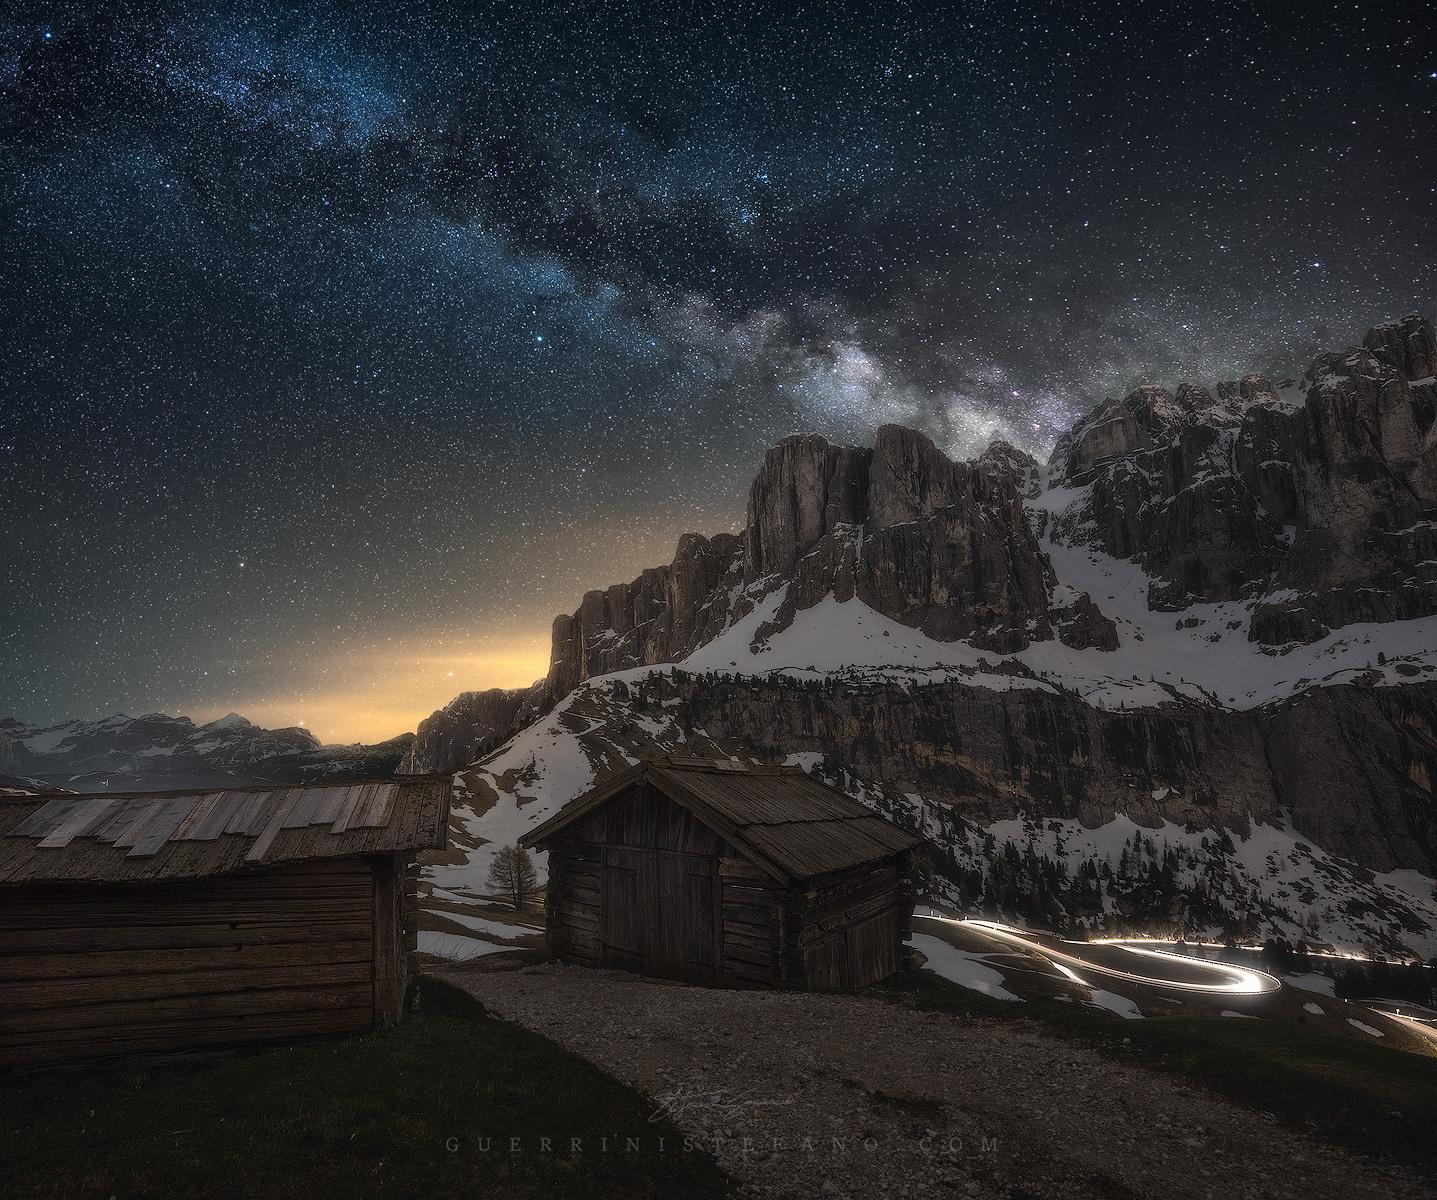 MilkyWay Huts Gardena Dolomiti Guerrini Stefano